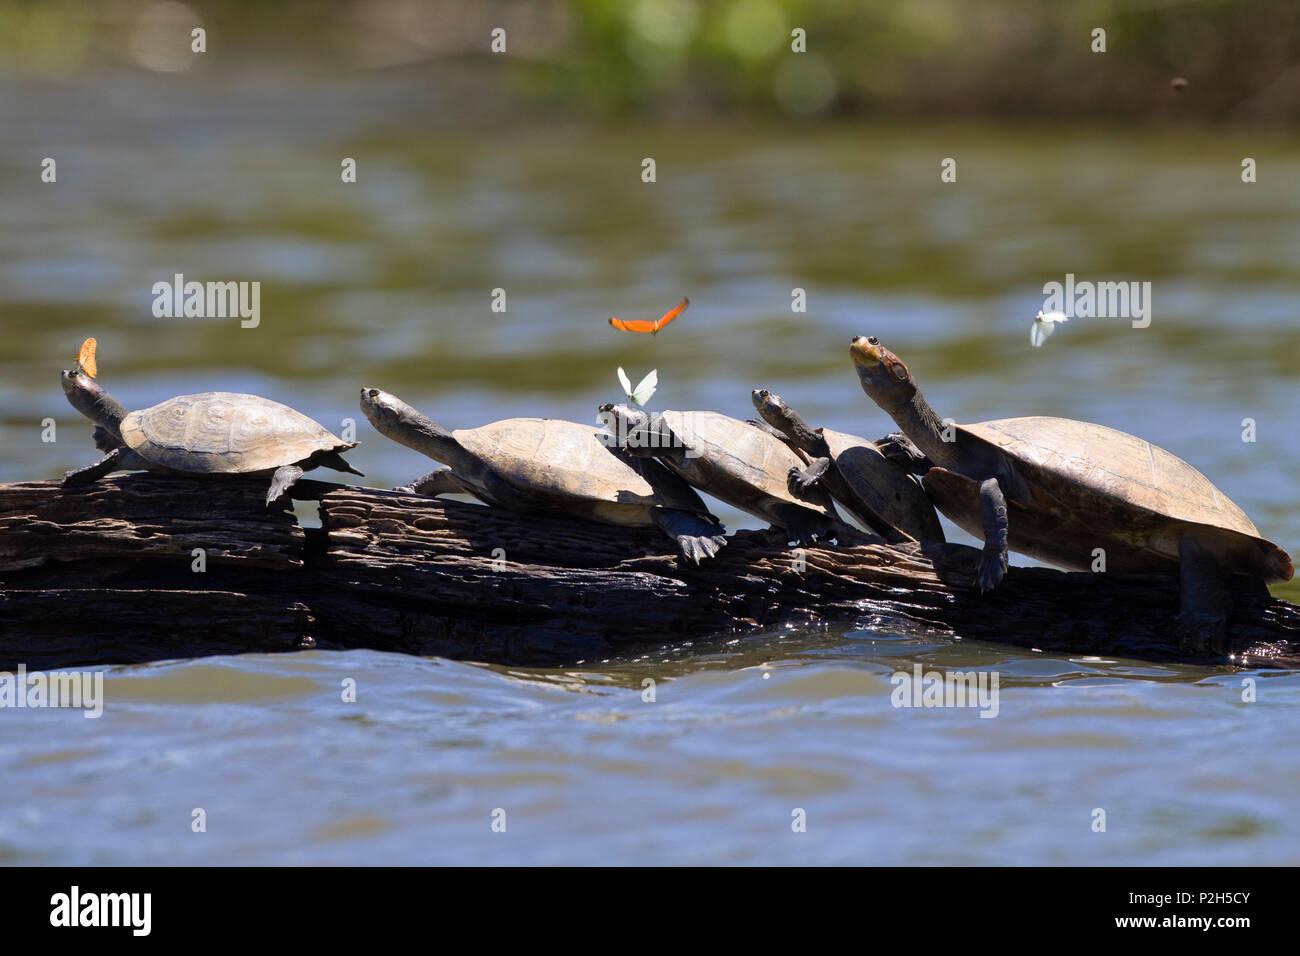 Amazon River Turtles, Podocnemis unifilis, Tambopata National Reserve, Peru, South America - Stock Image